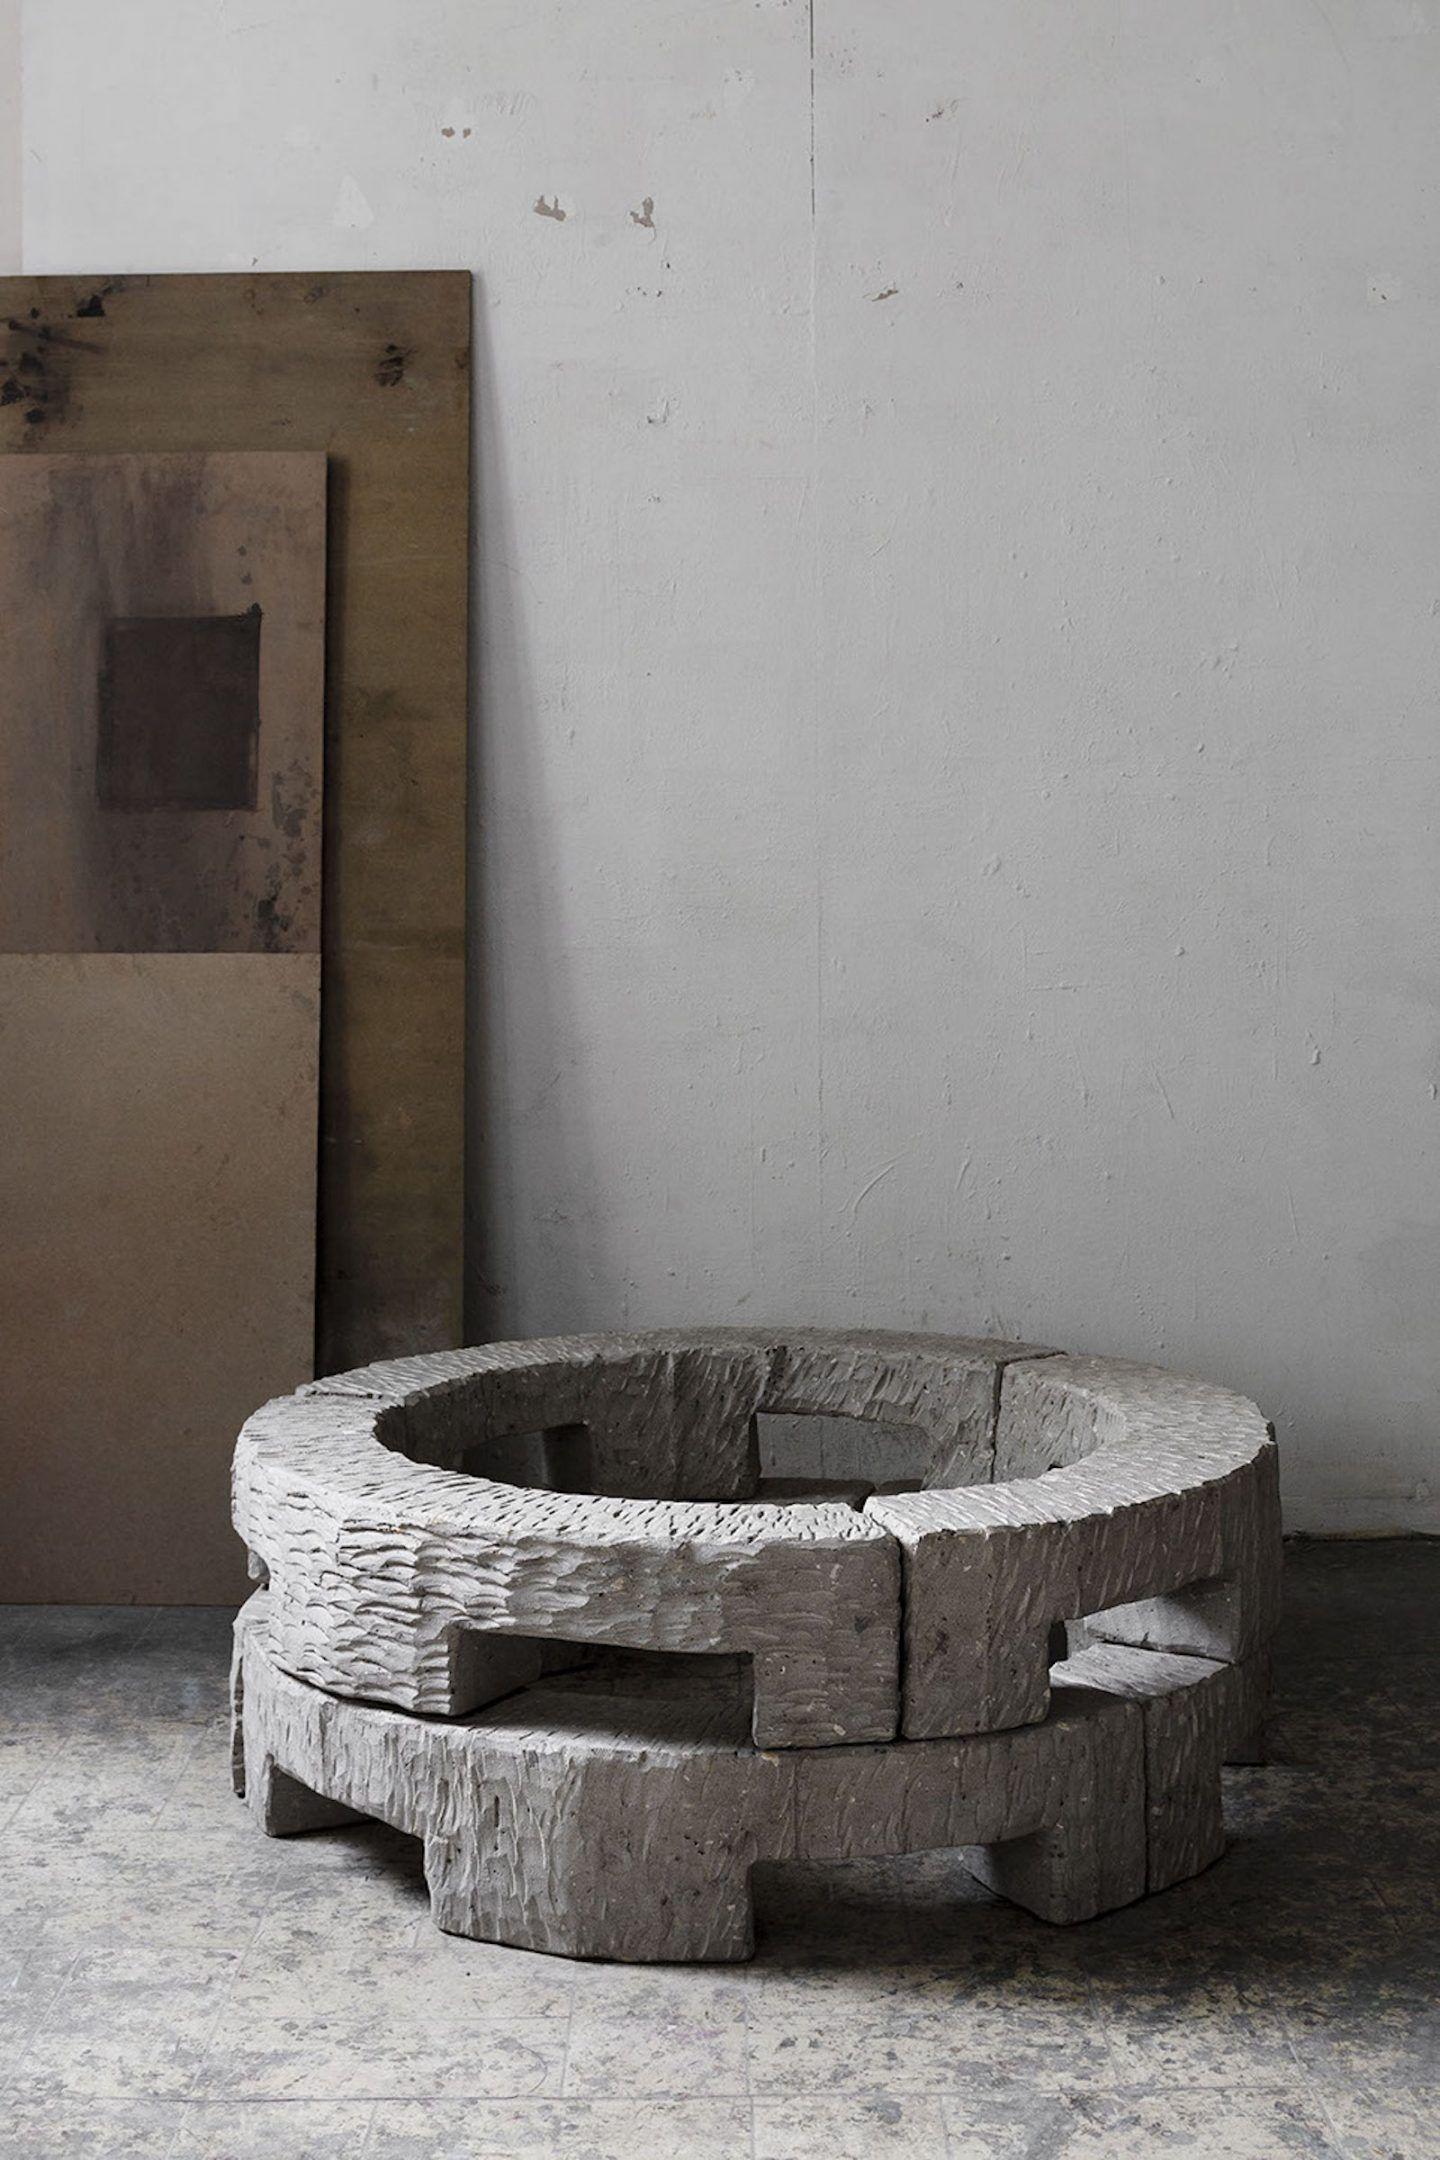 IGNANT-Design-Bram-Vanderbeke-New-Primitives3-01